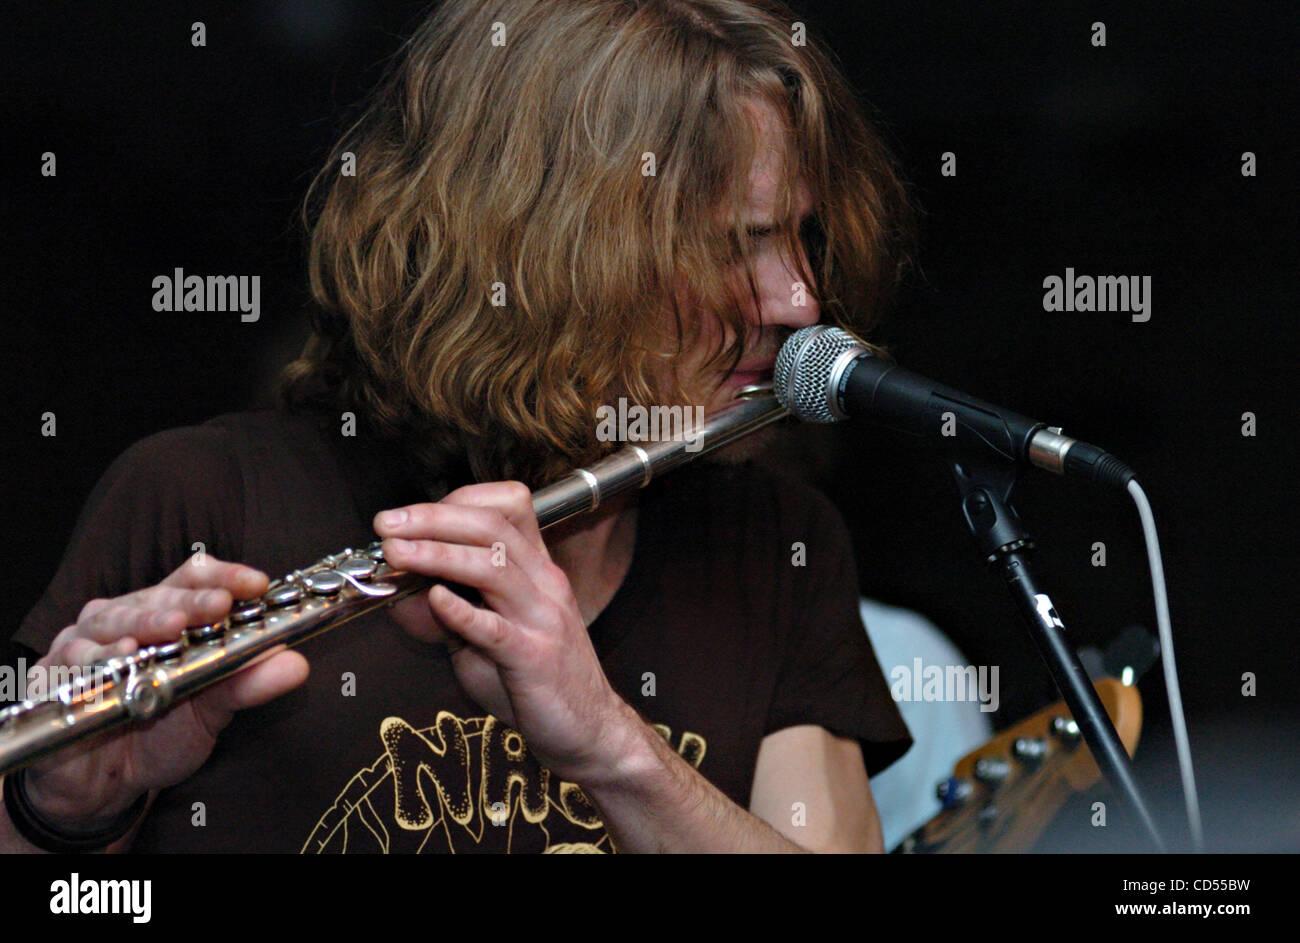 John Tipton ZUMA Press Swedish Band Dungen Led By Gustav Ejstes Plays Tuesday Nov 11 2008 At The Cellar Door In Visalia Ca